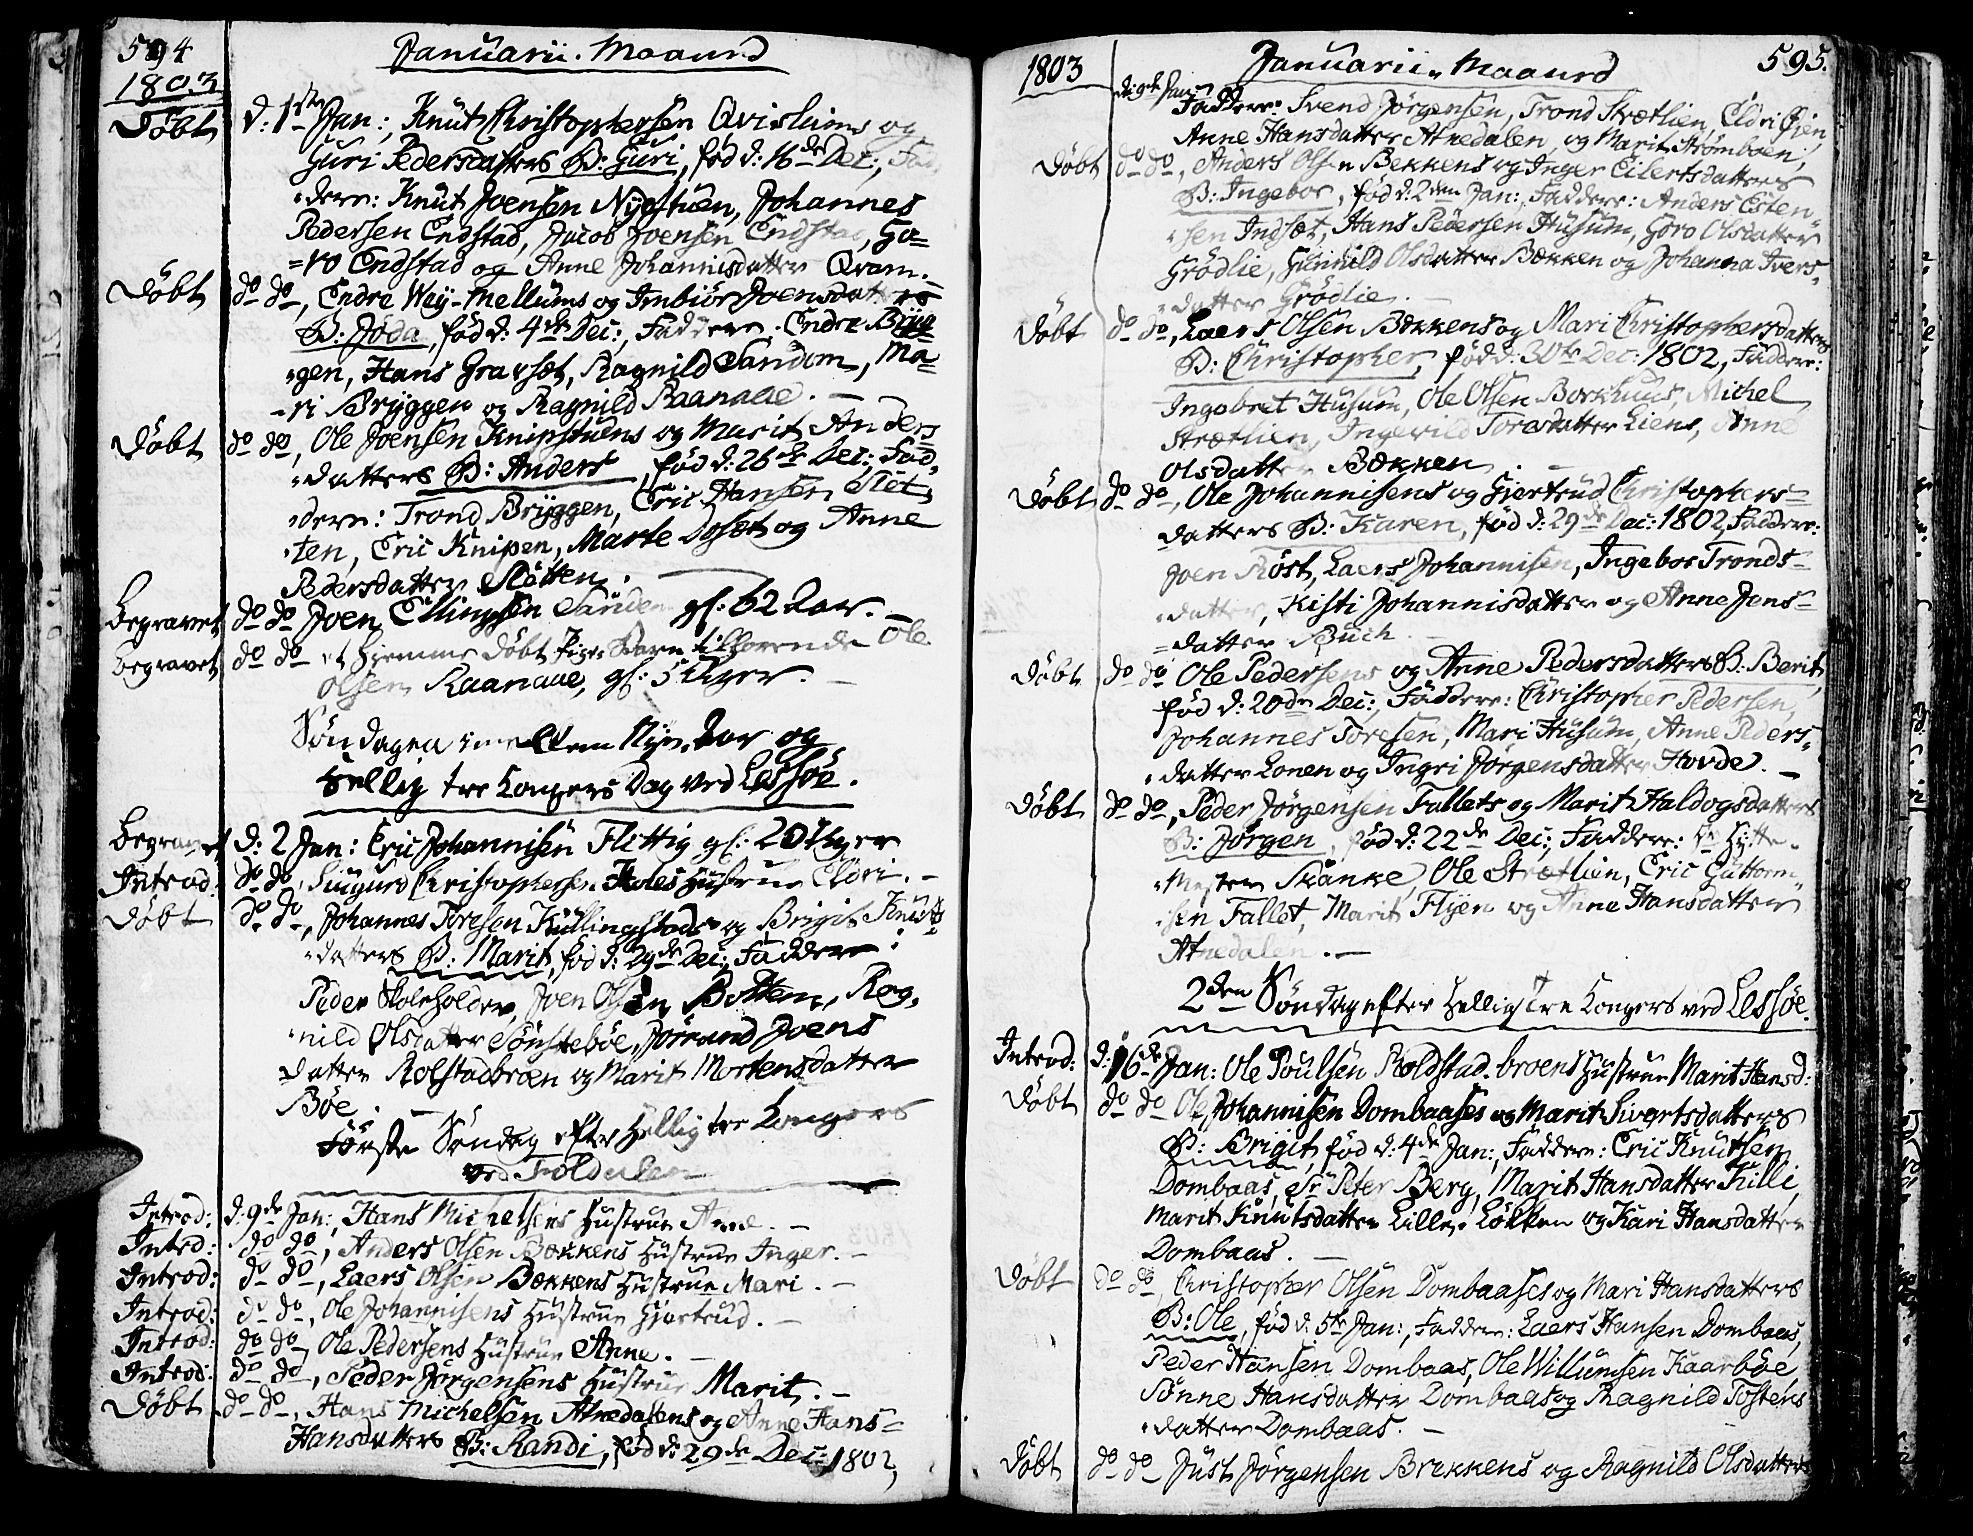 SAH, Lesja prestekontor, Ministerialbok nr. 3, 1777-1819, s. 594-595